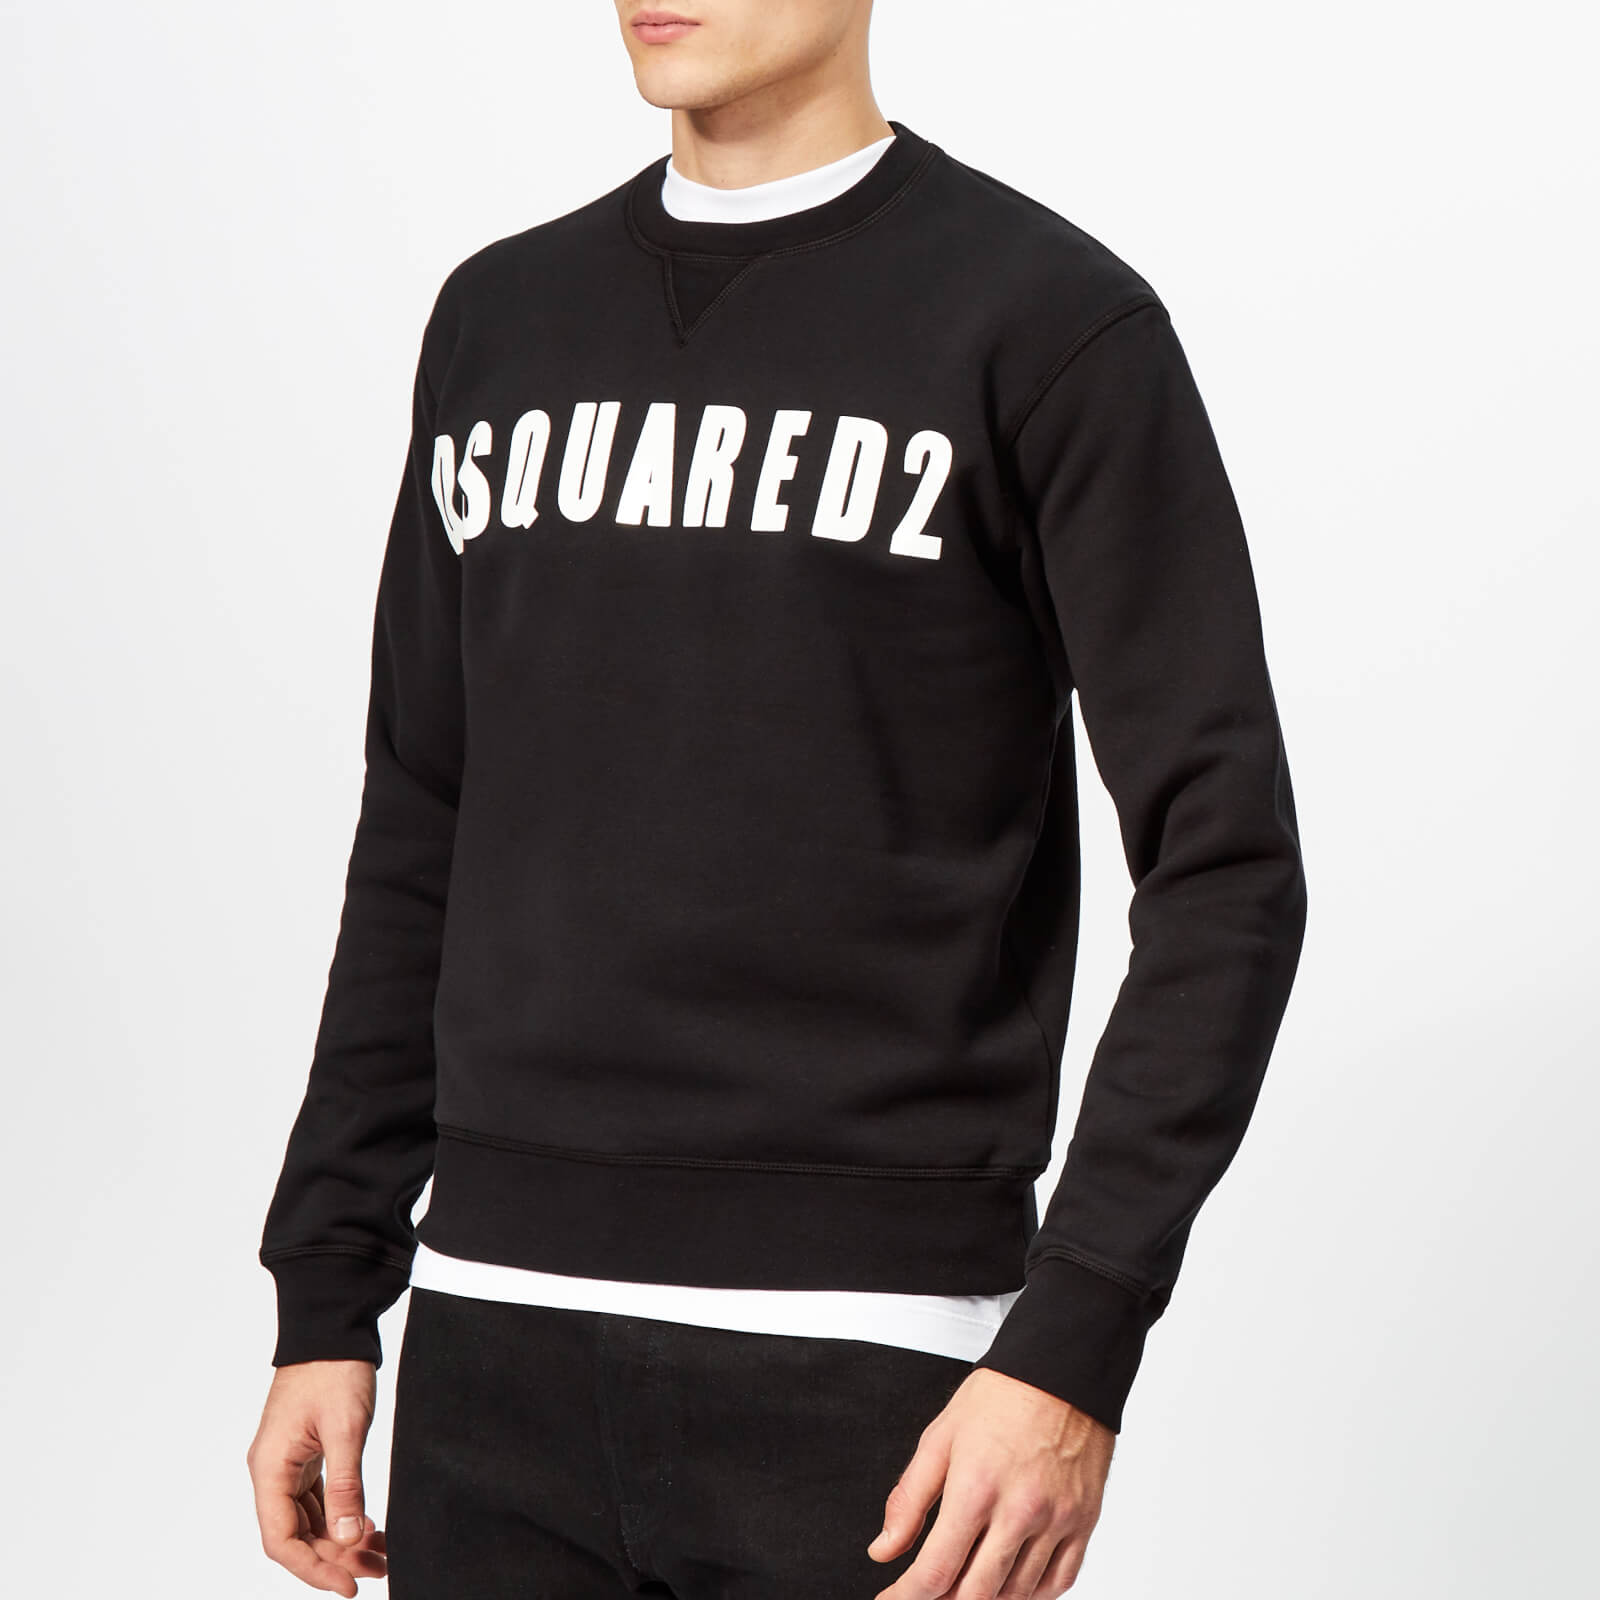 69a14199fdf0 Dsquared2 Men s Dsquared2 Logo Sweatshirt - Black - Free UK Delivery over  £50